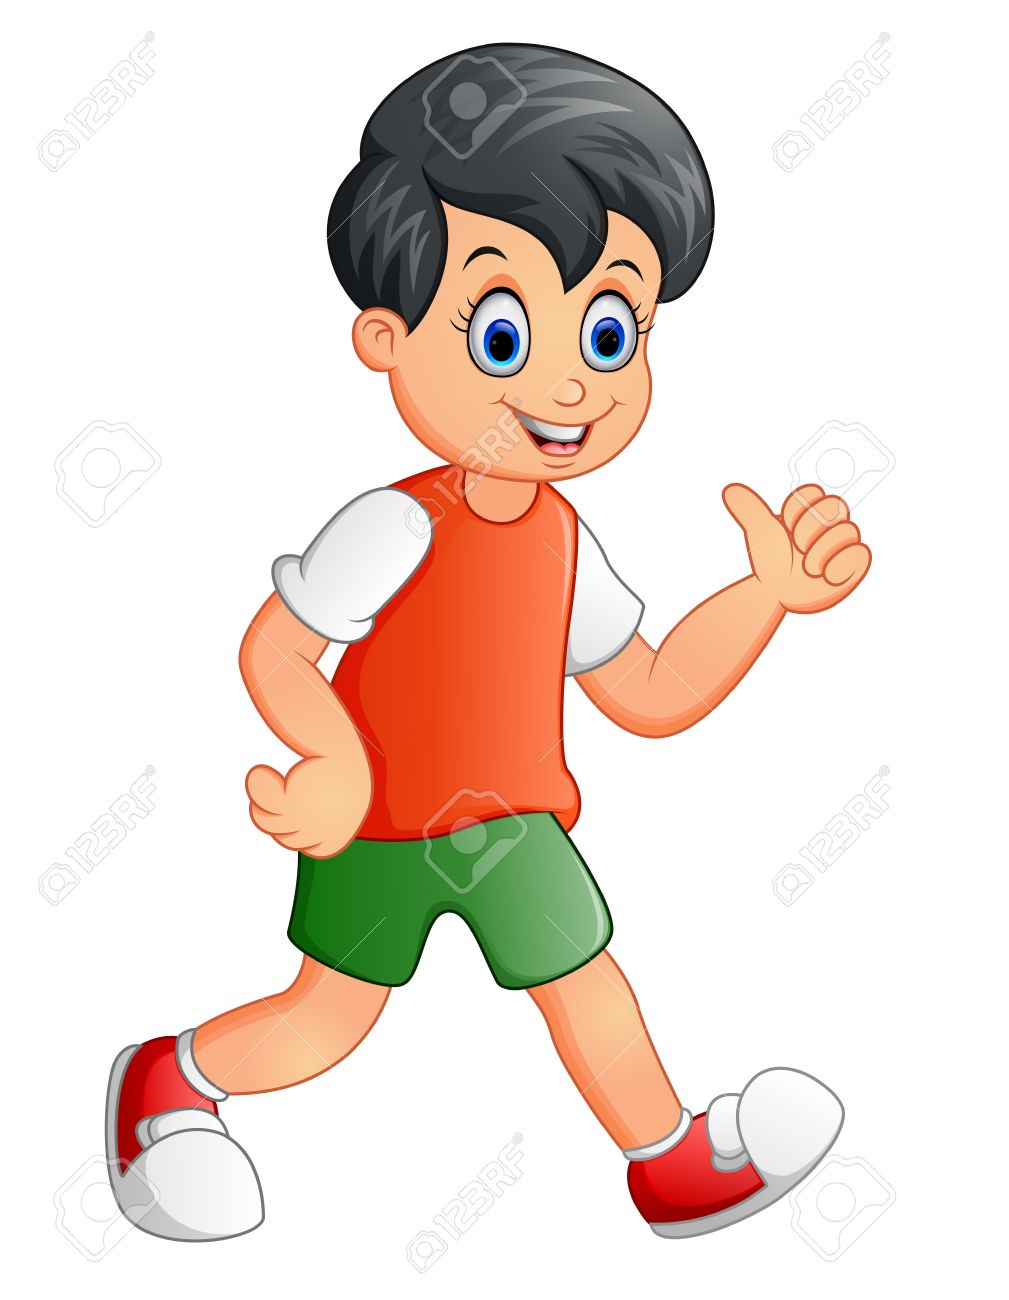 Cute Boy Cartoon Giving Thumb Up Royalty Free Cliparts, Vectors ... clip art free